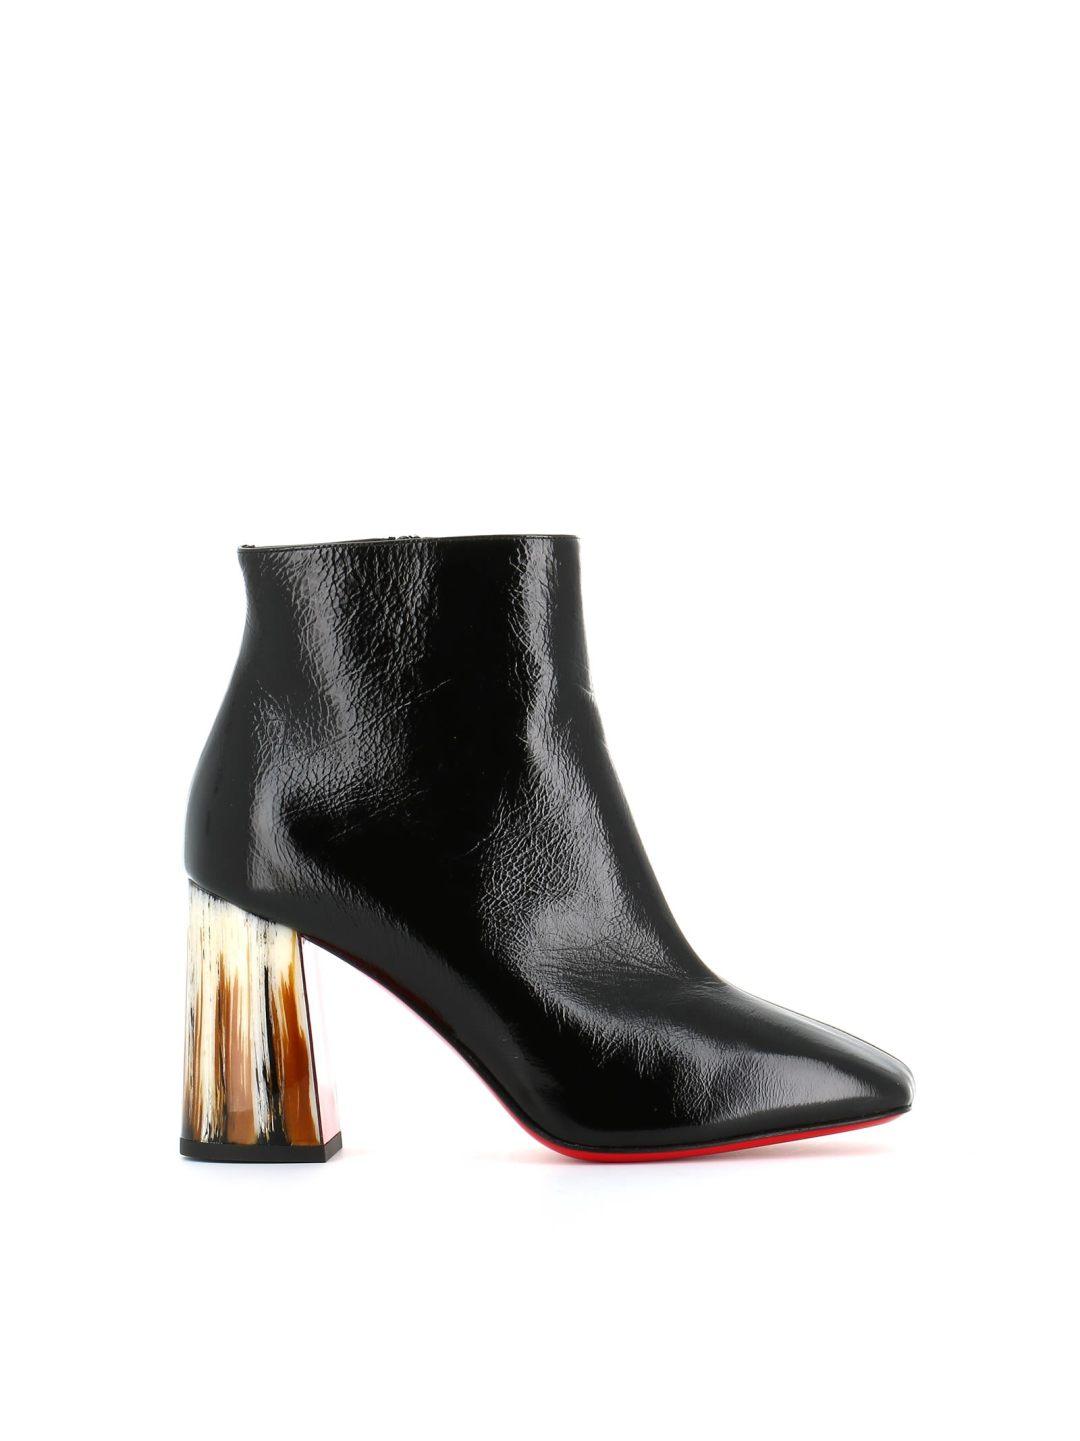 "0d4c1f0cd9bd Christian Louboutin Ankle Boot ""hilconico"" – Italist.com US –  910.83"